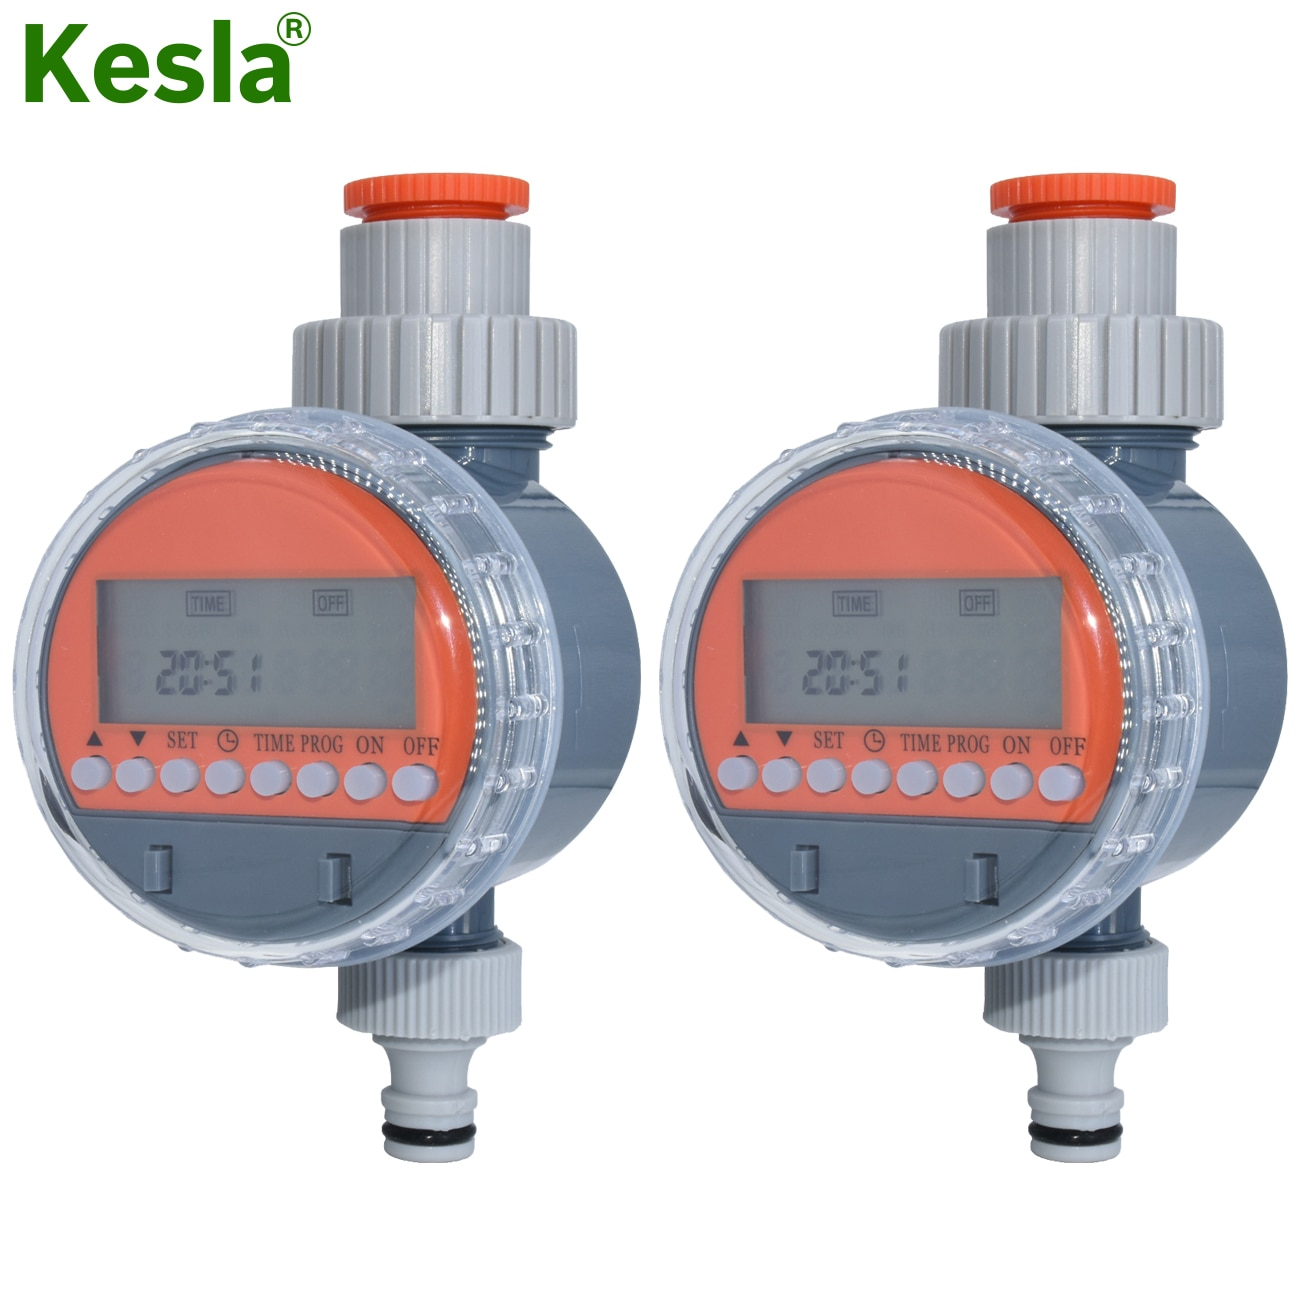 KESLA حديقة الري الكرة صمام مؤقت مياه LCD التلقائي الإلكترونية الري المنزل نظام مراقبة الري الدفيئة